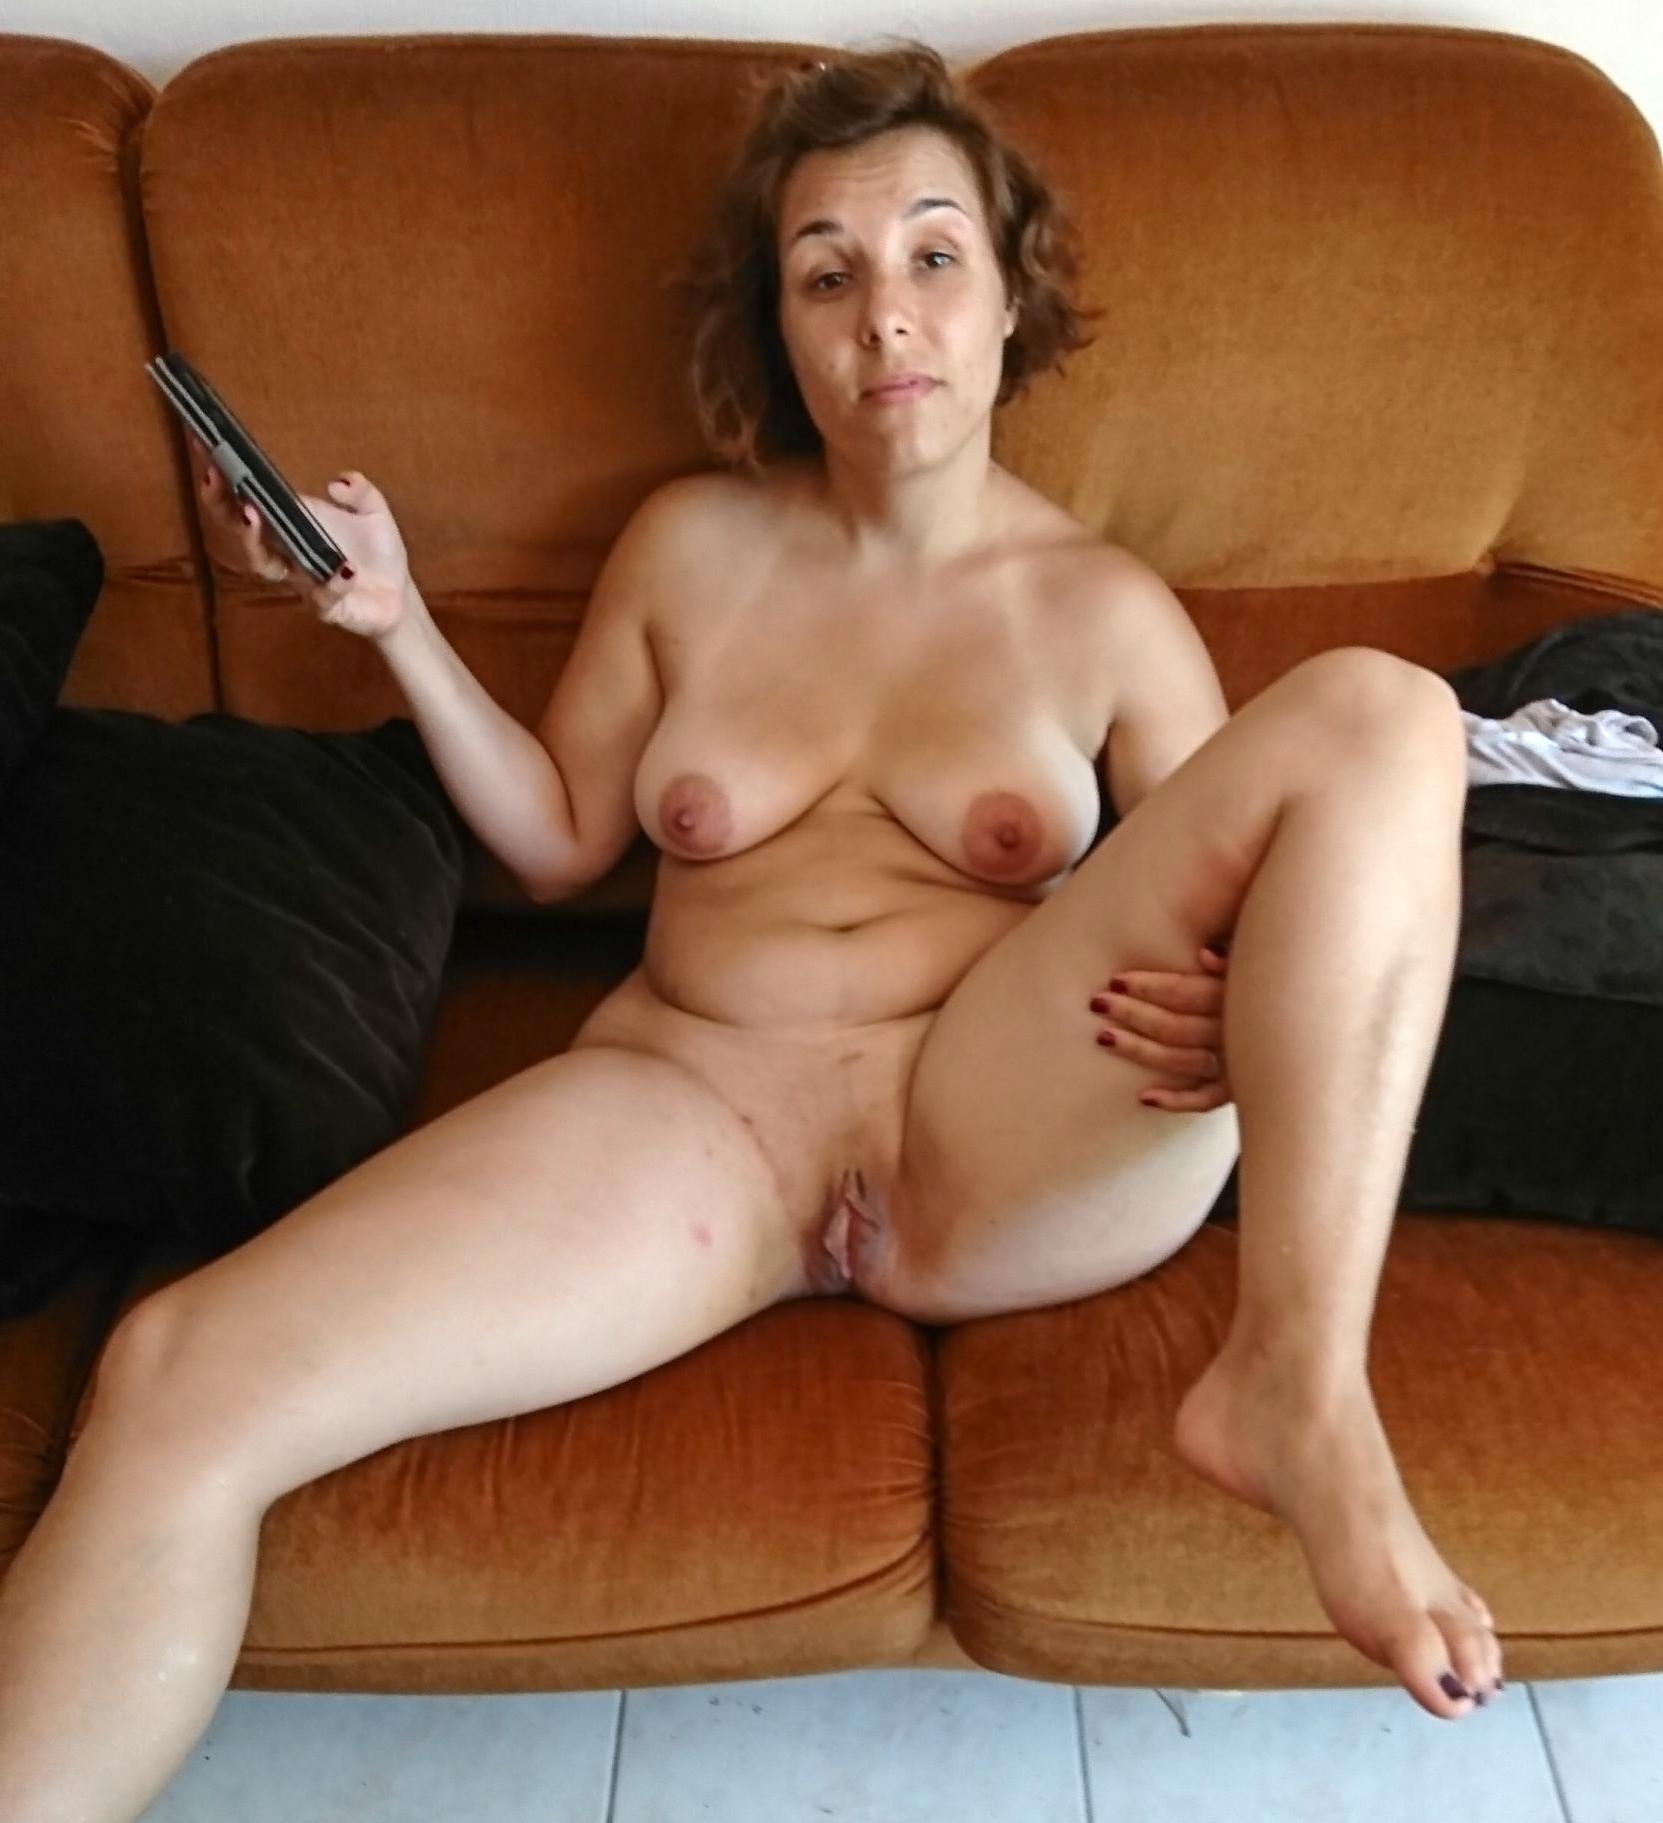 nasty lesbian anal strapon tube8